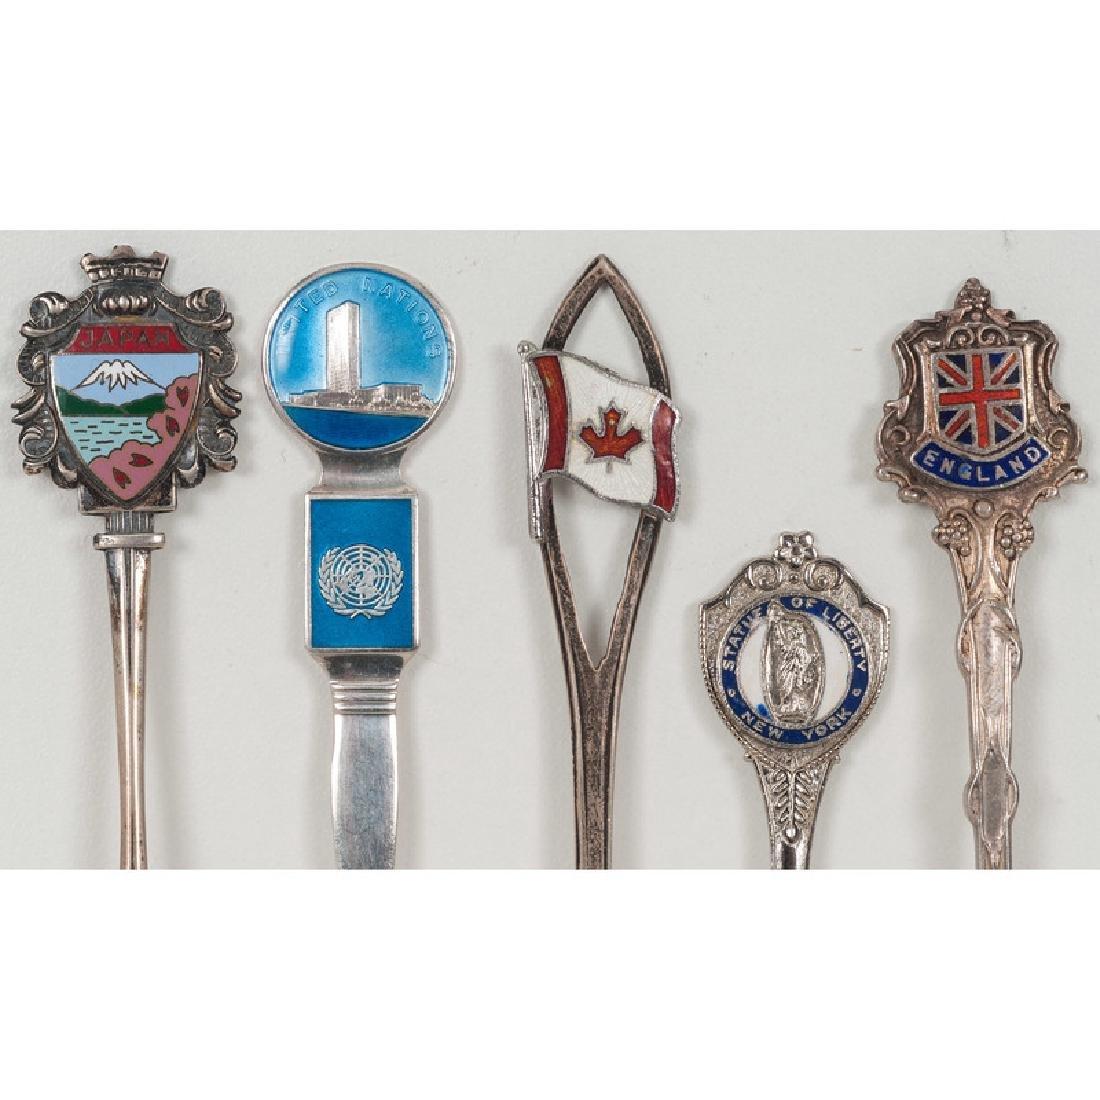 Sterling Souvenir Spoons - 7